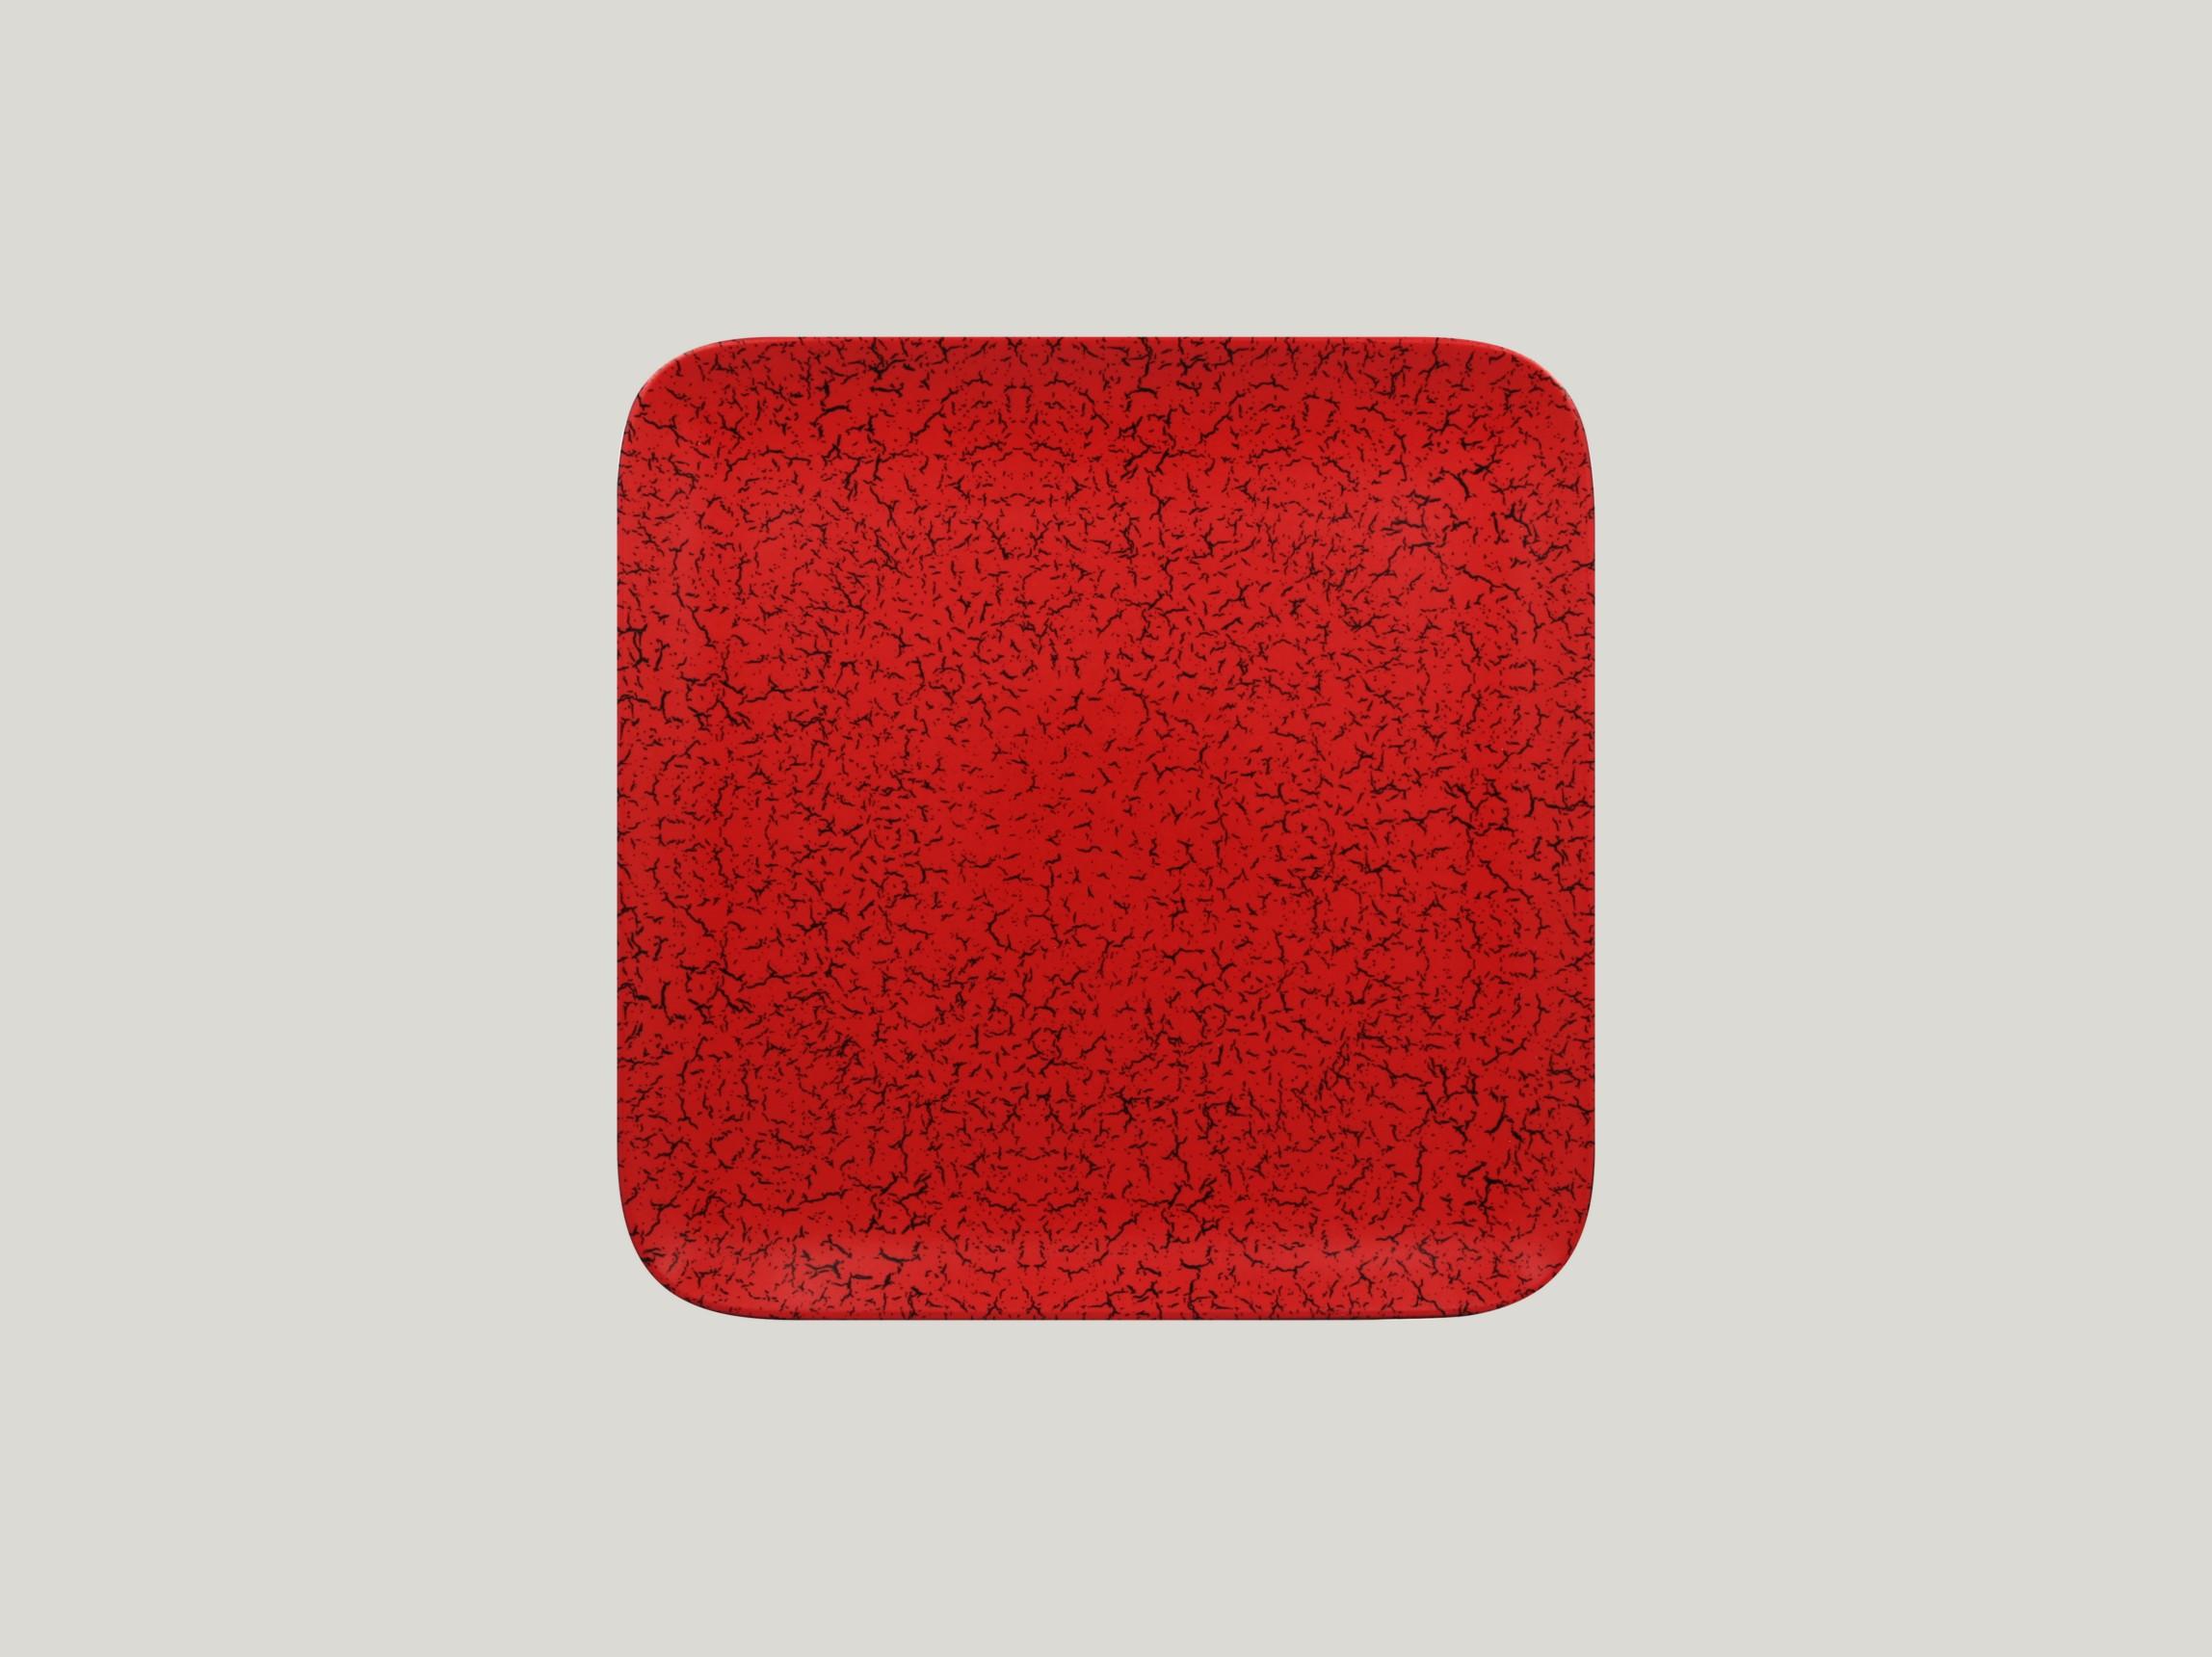 Talíř čtvercový 24 x 24 cm - červená